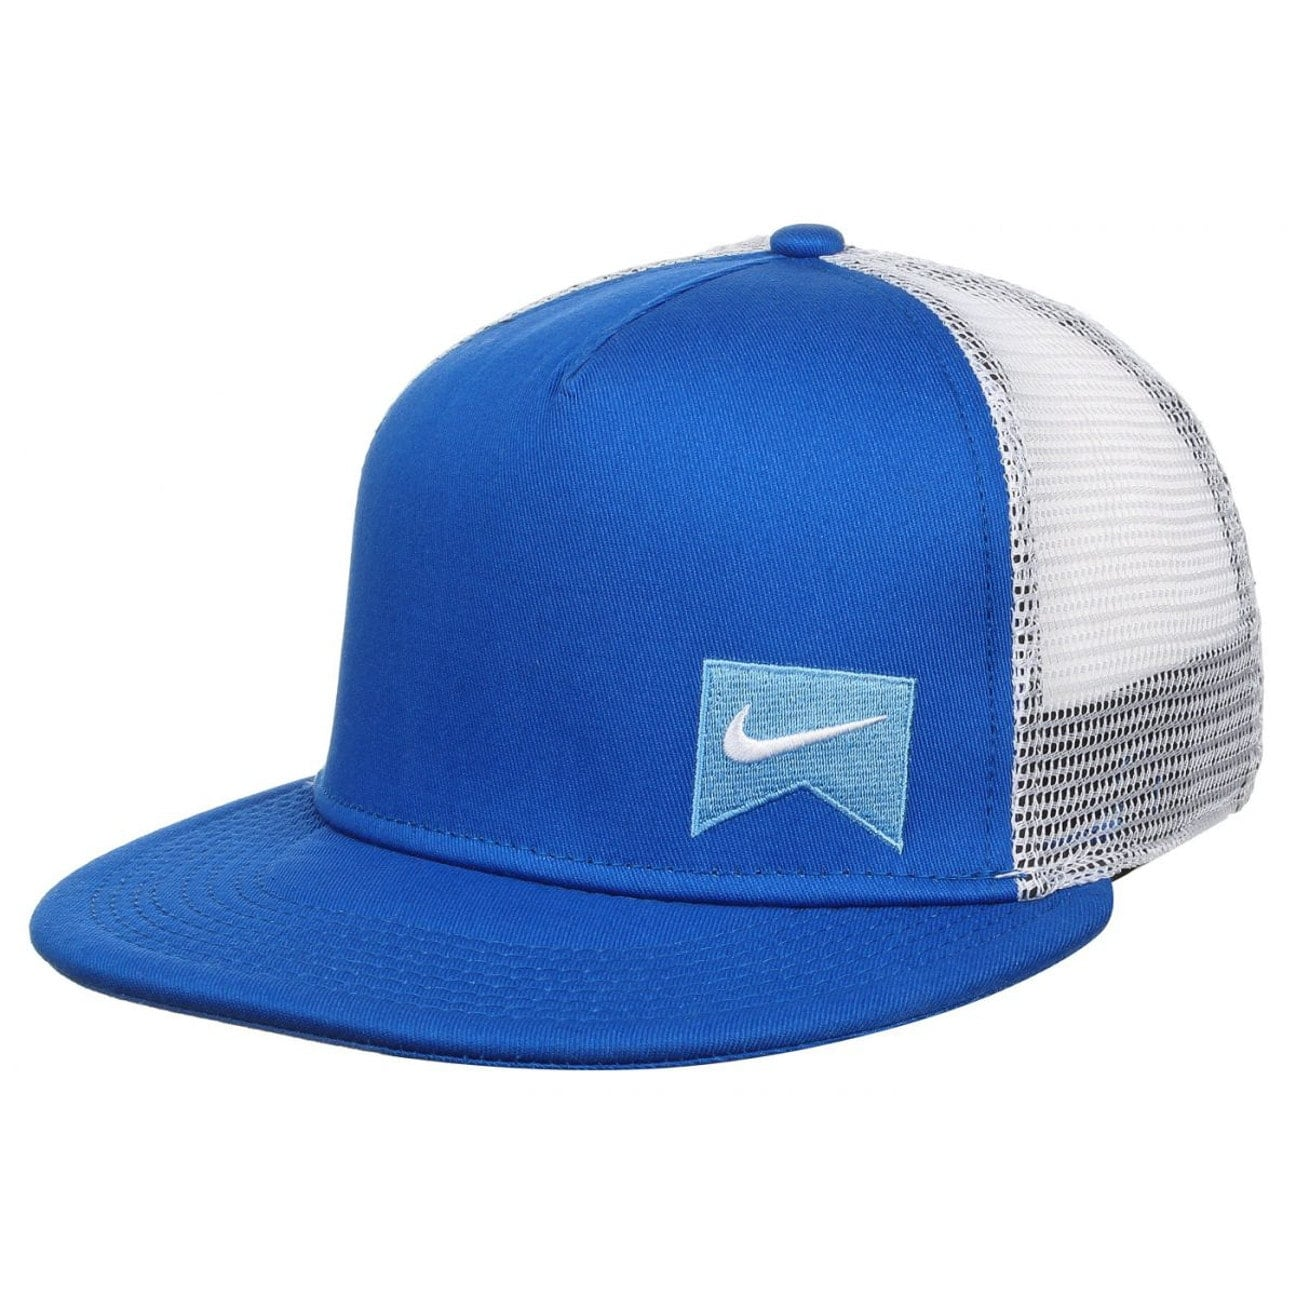 8638ec38810 ... Icon Trucker Snapback Cap by NIKE - royal-blue 1